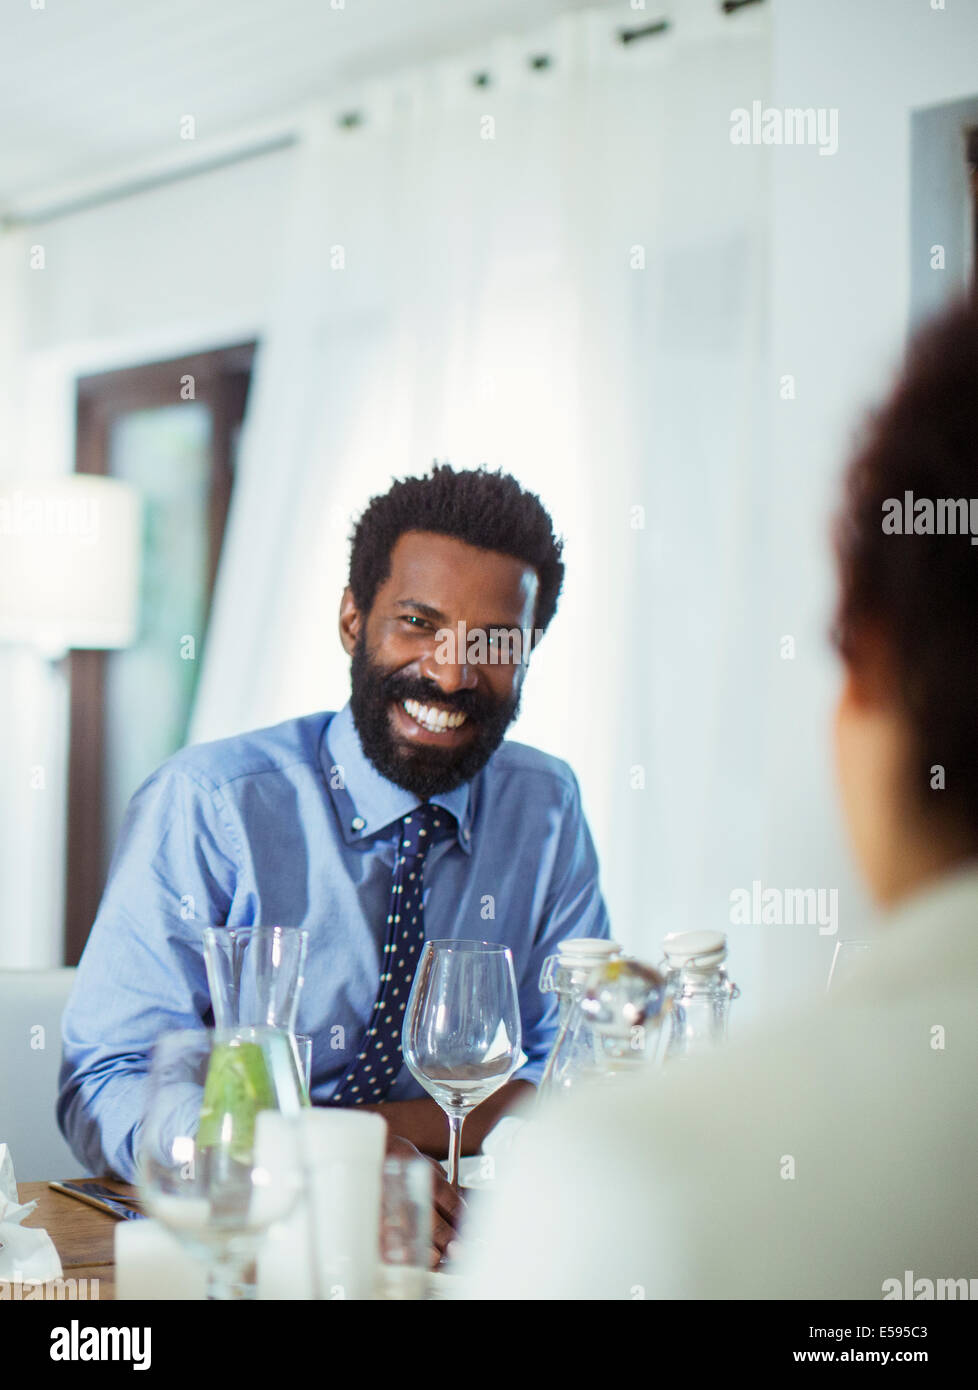 Paio mangiare insieme a tavola Immagini Stock